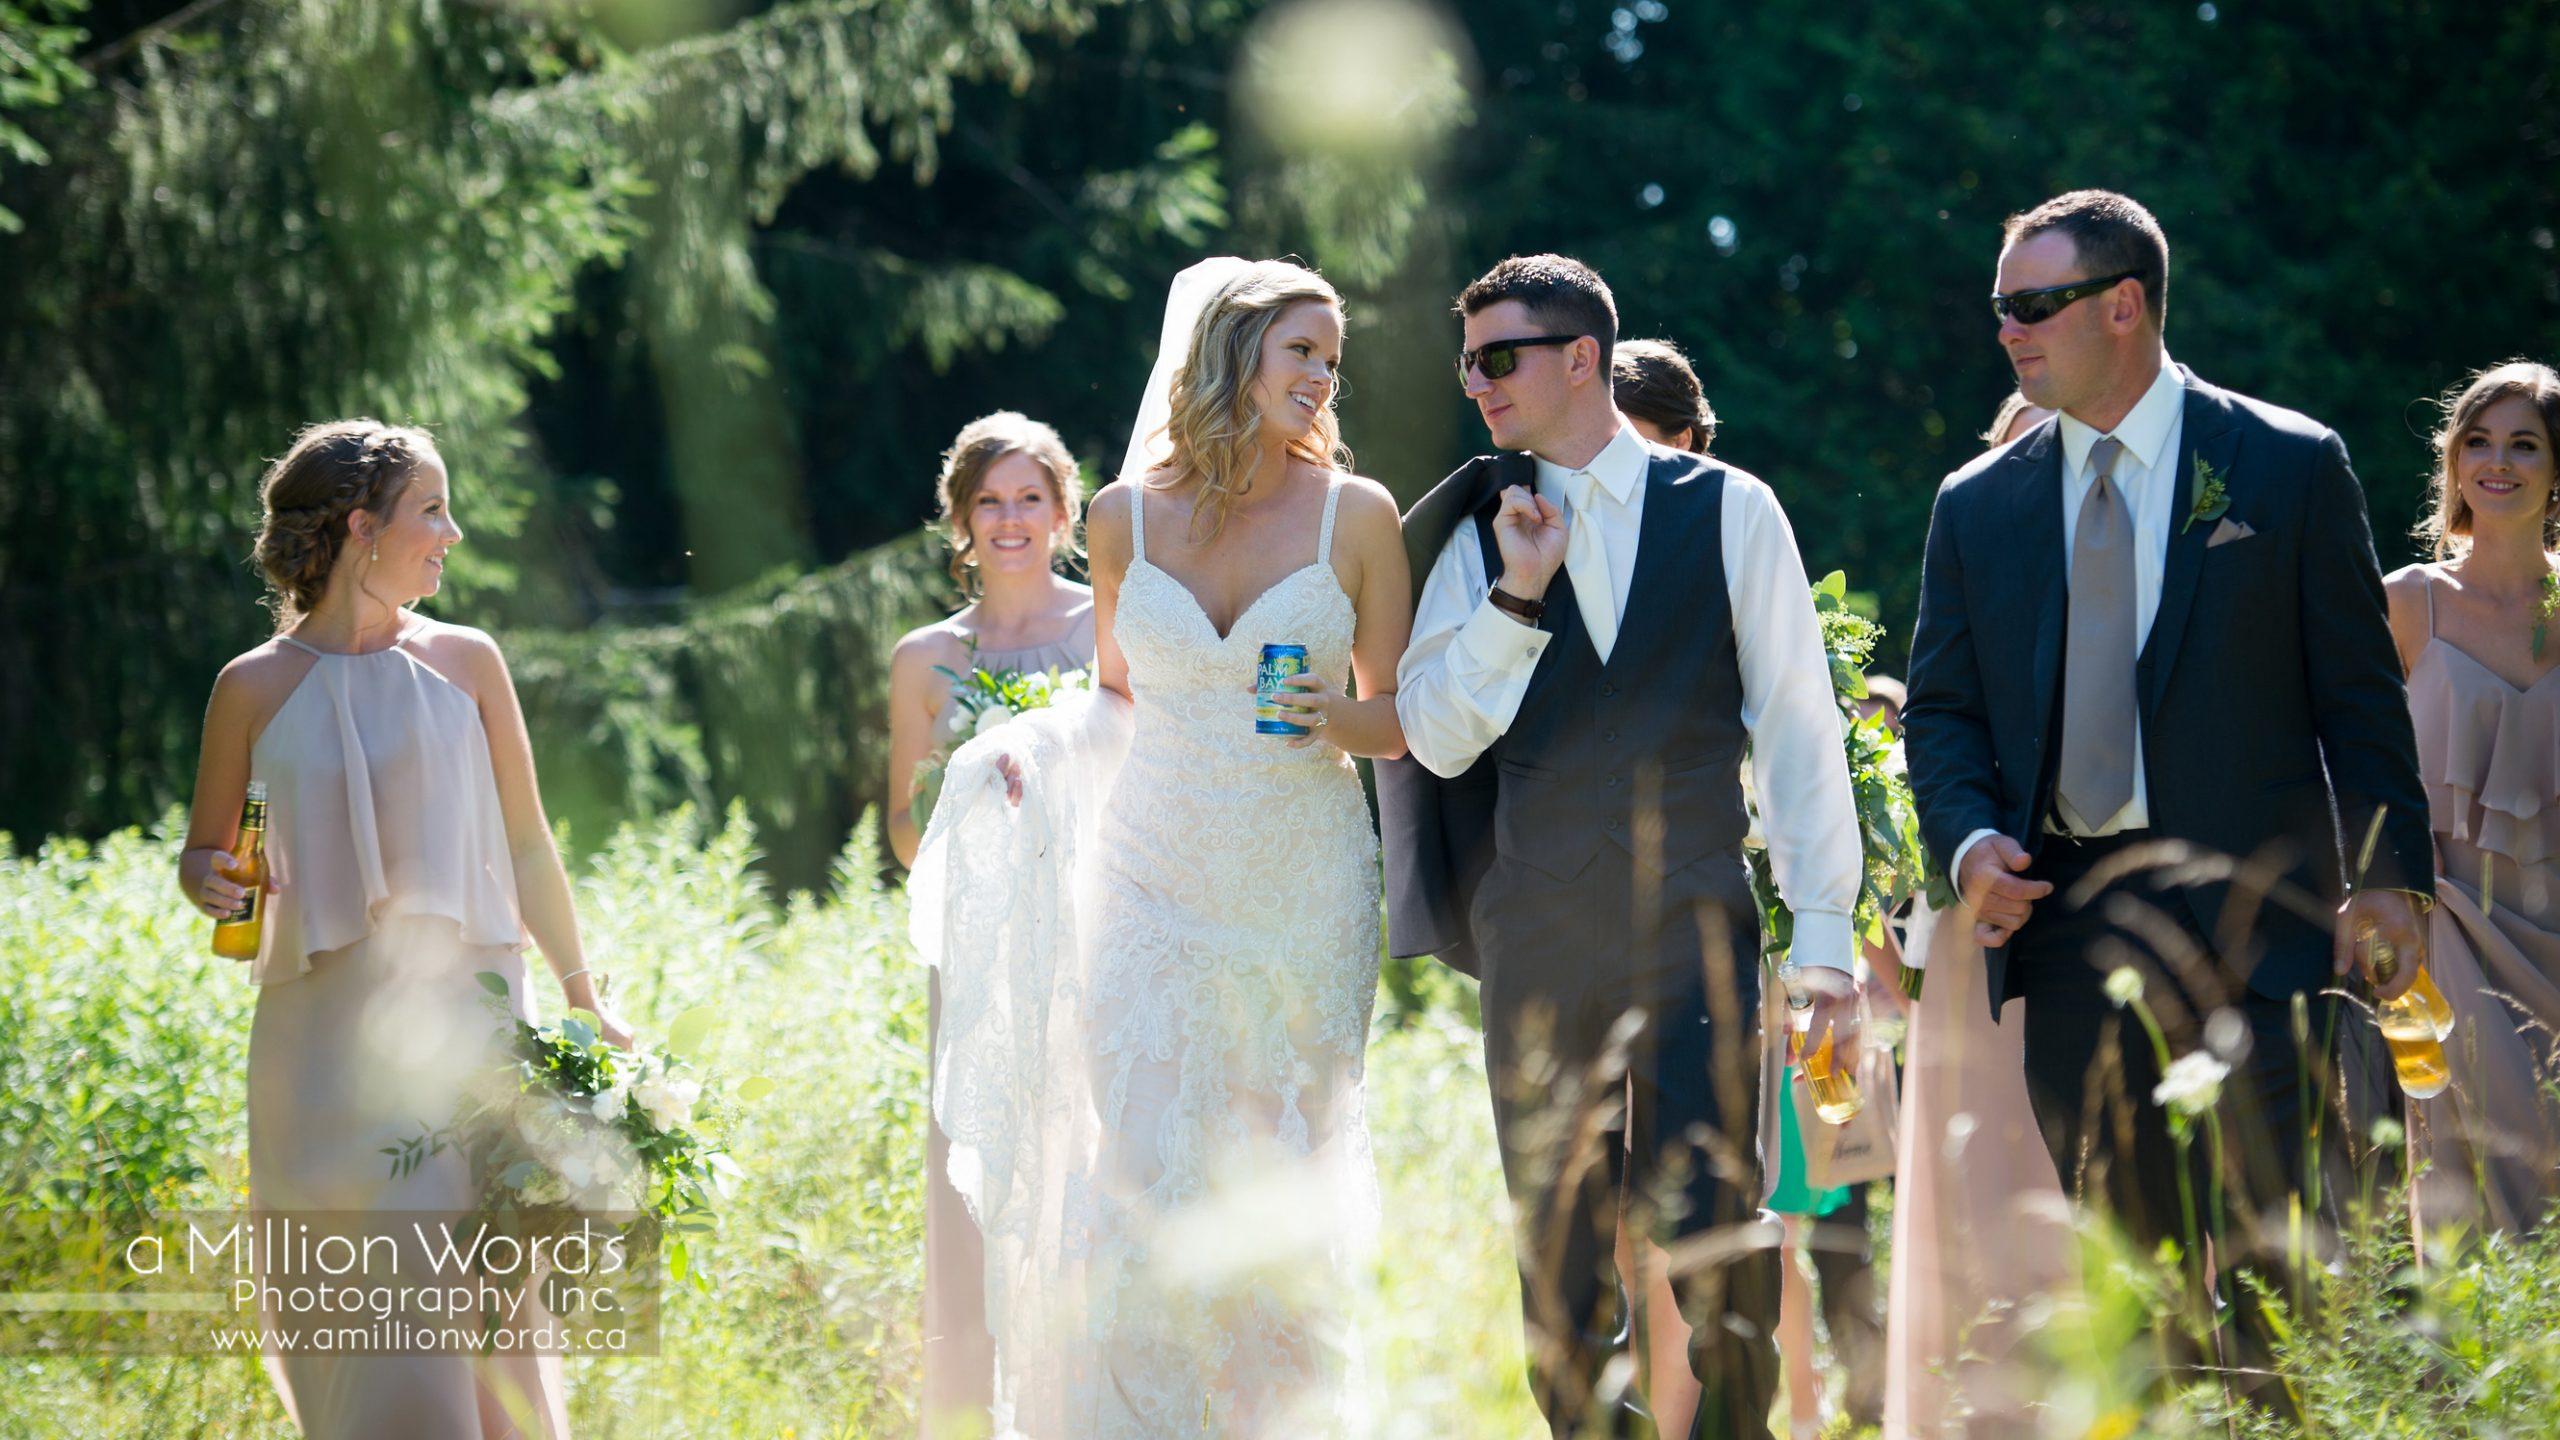 arthur_wedding_photographer45